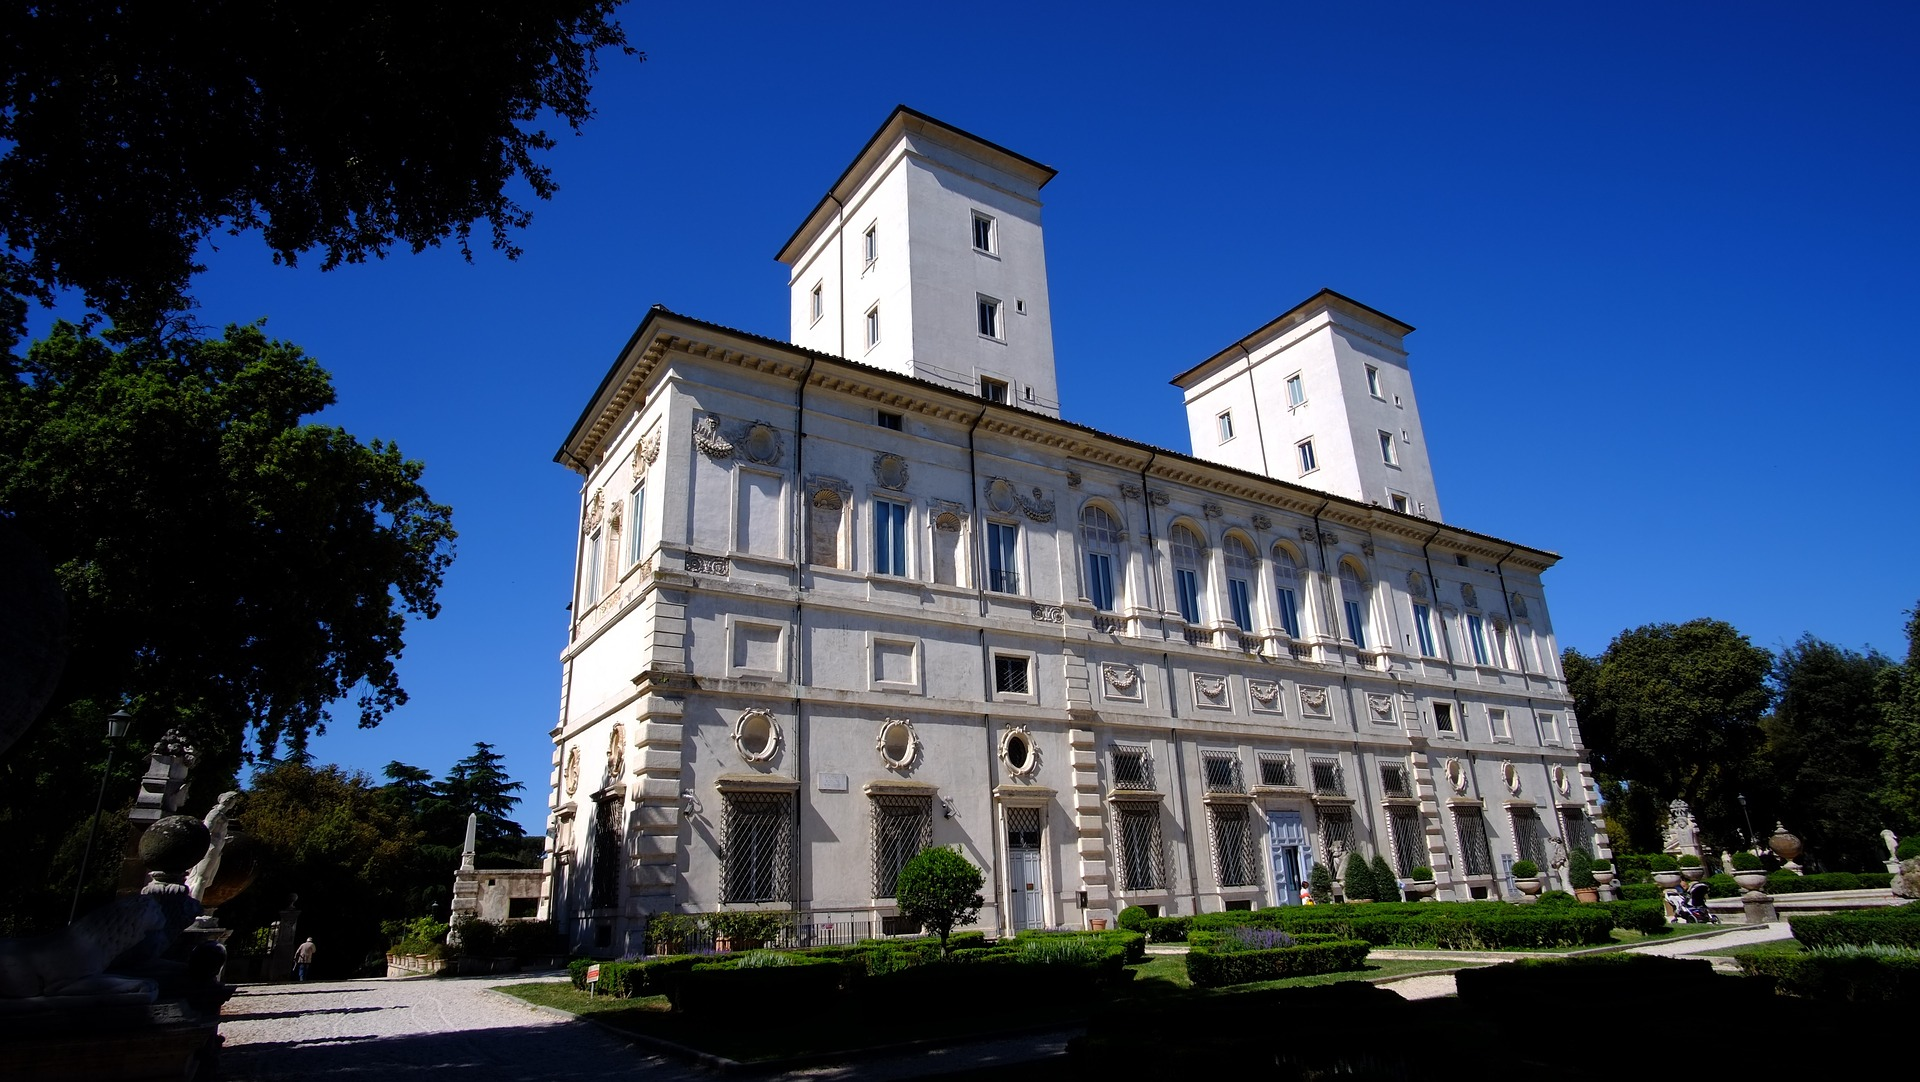 Museo e Galleria Borghese, Rome